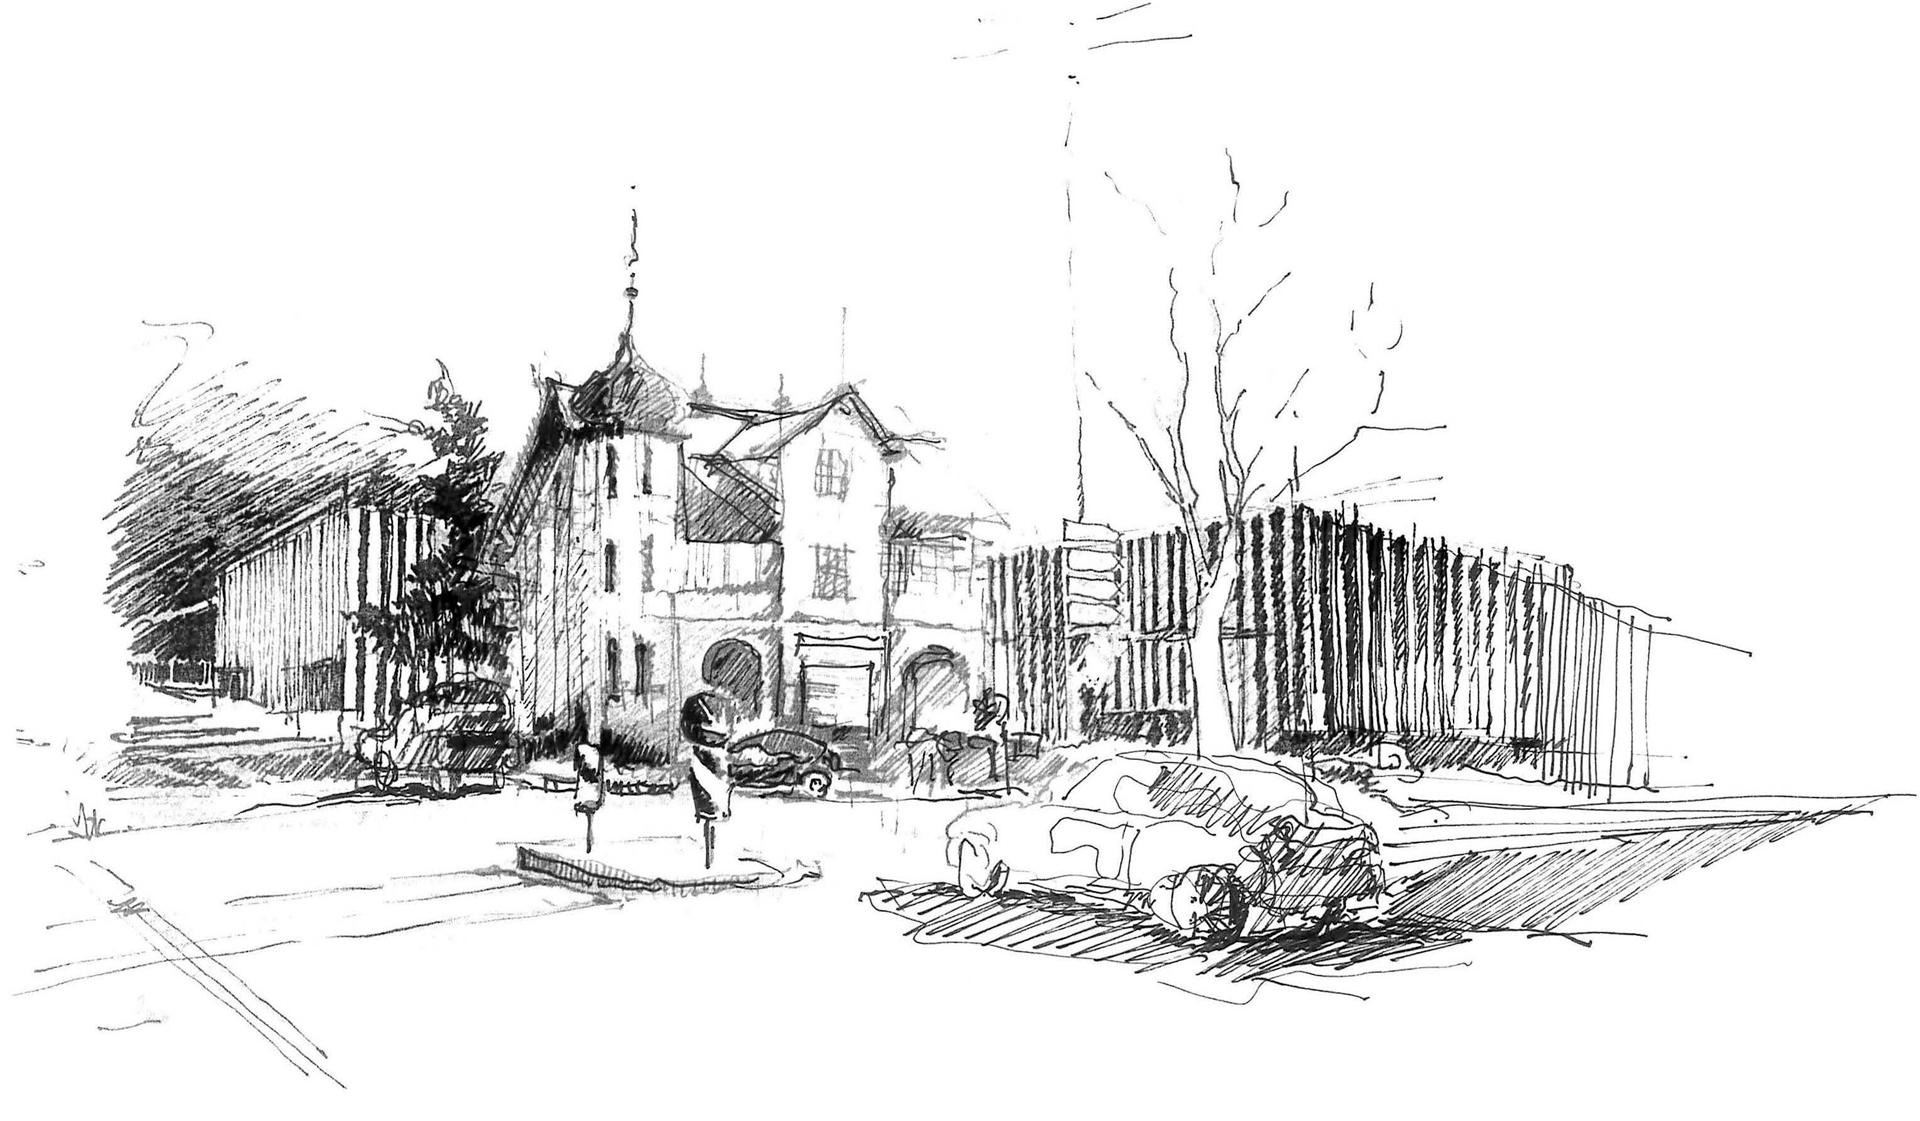 2014 – Kirchseeon